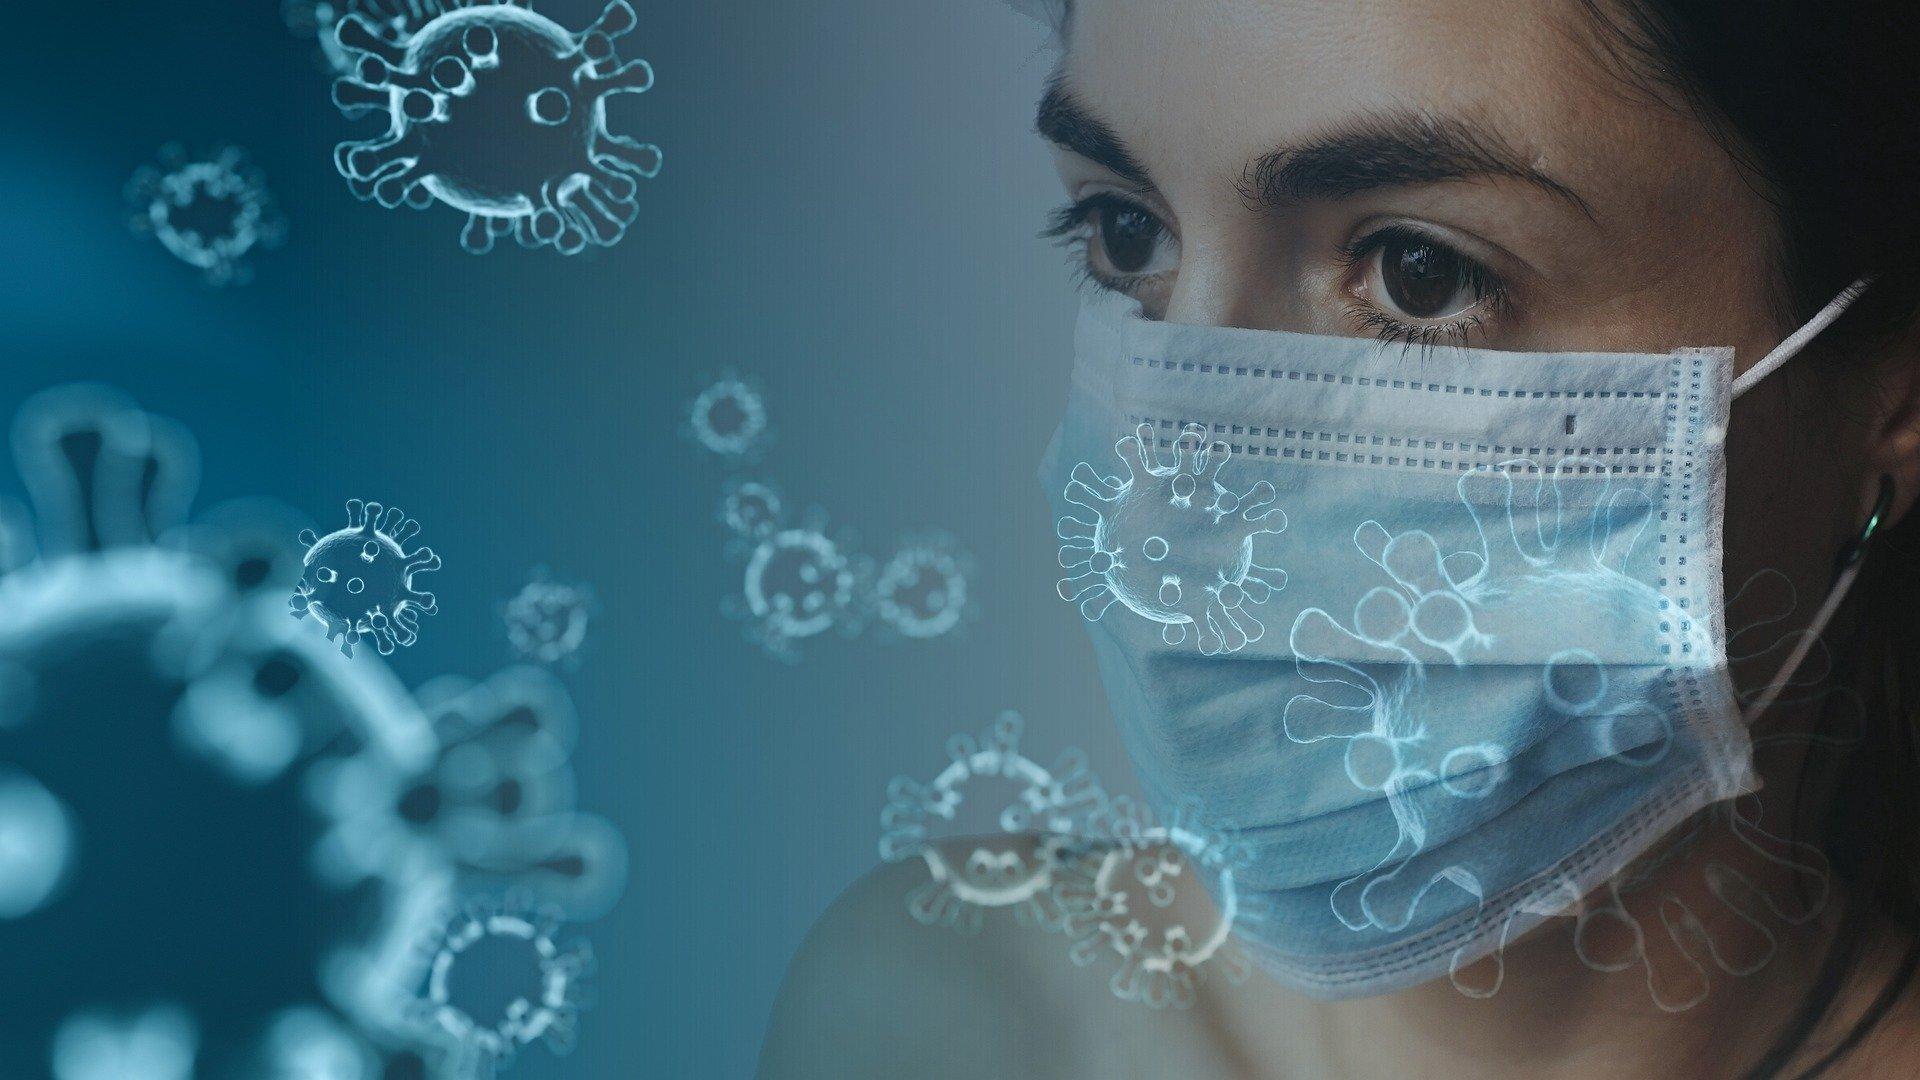 virus image with girl wearing mask